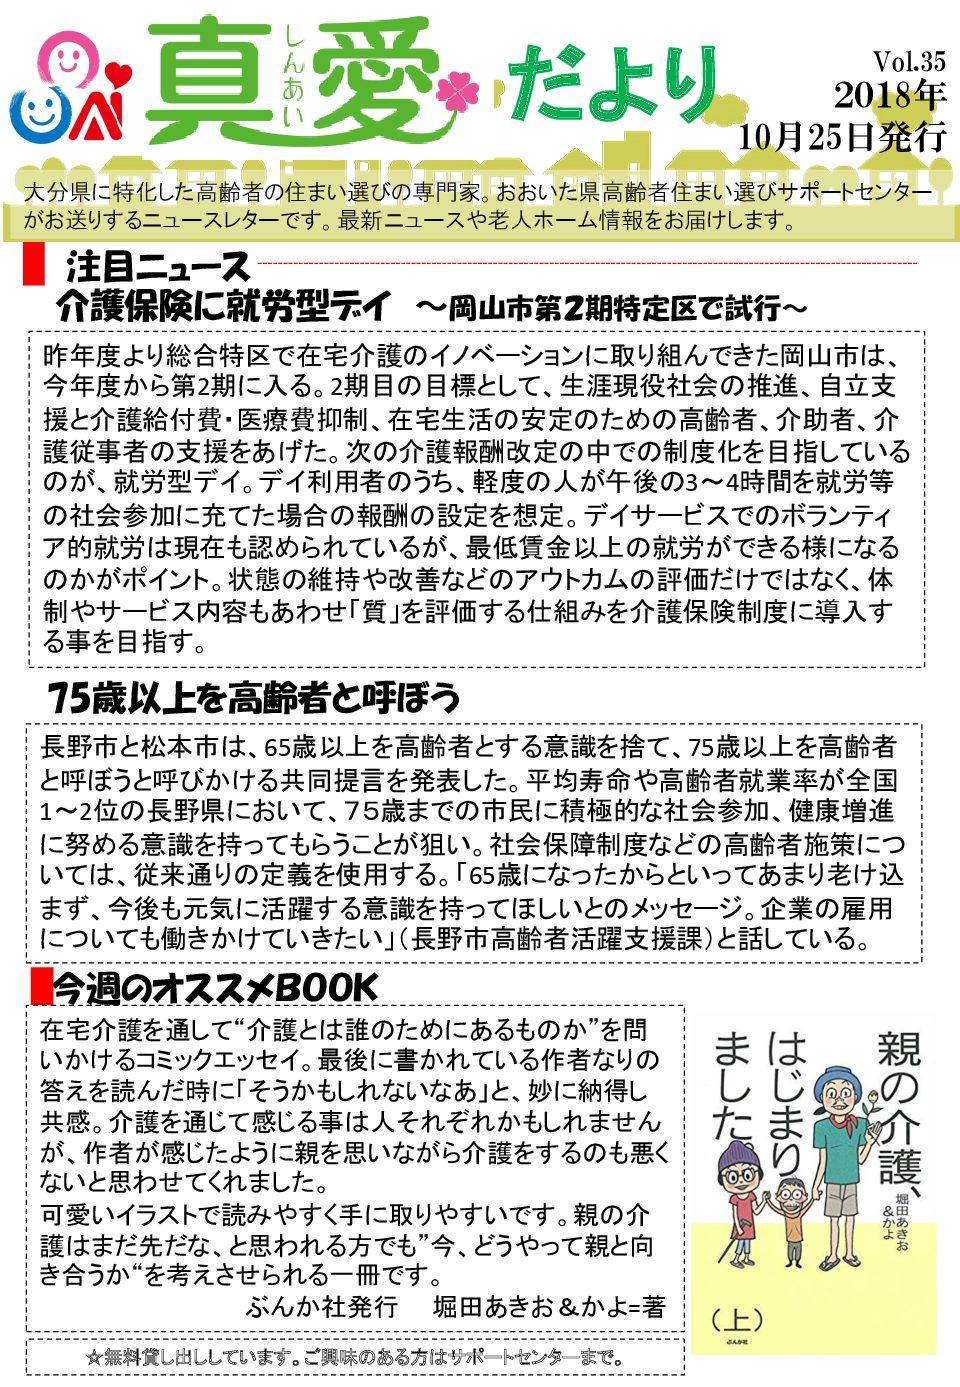 【Vol.35】 2018.10.25発行